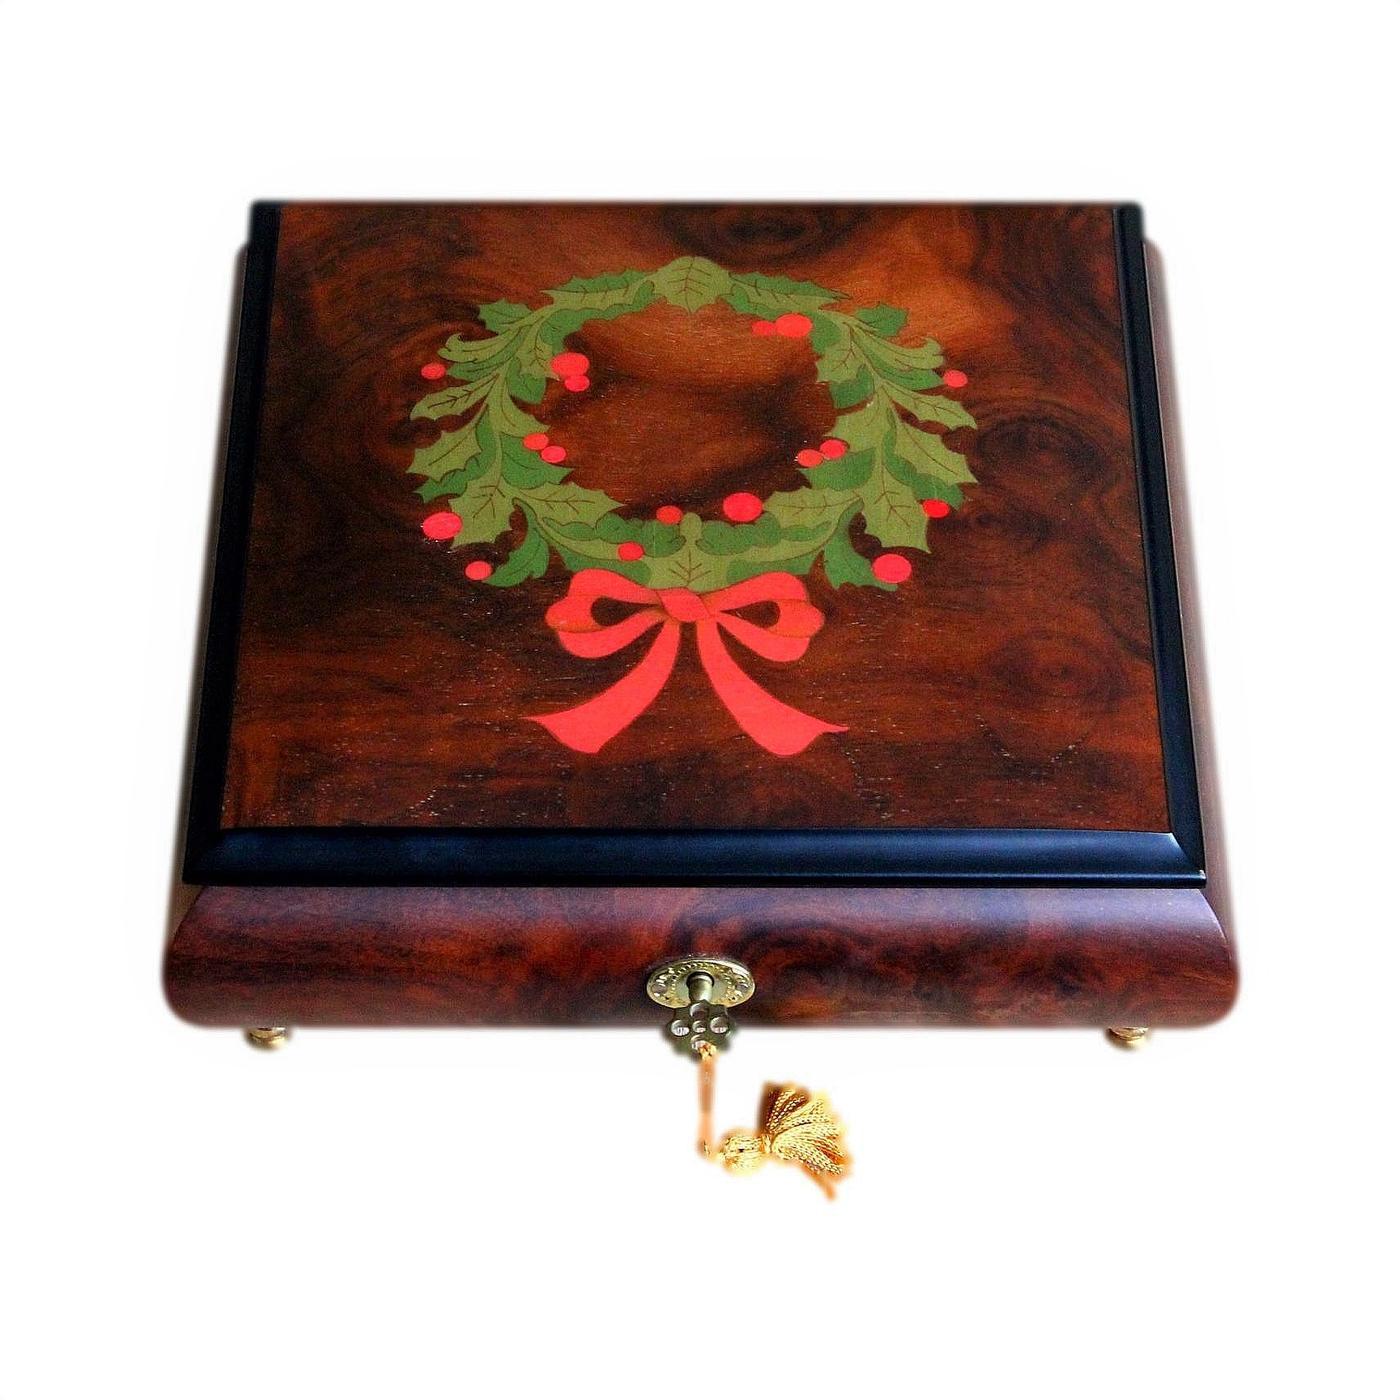 Stunning Inlaid Sorrento Vintage Musical Jewellery Box